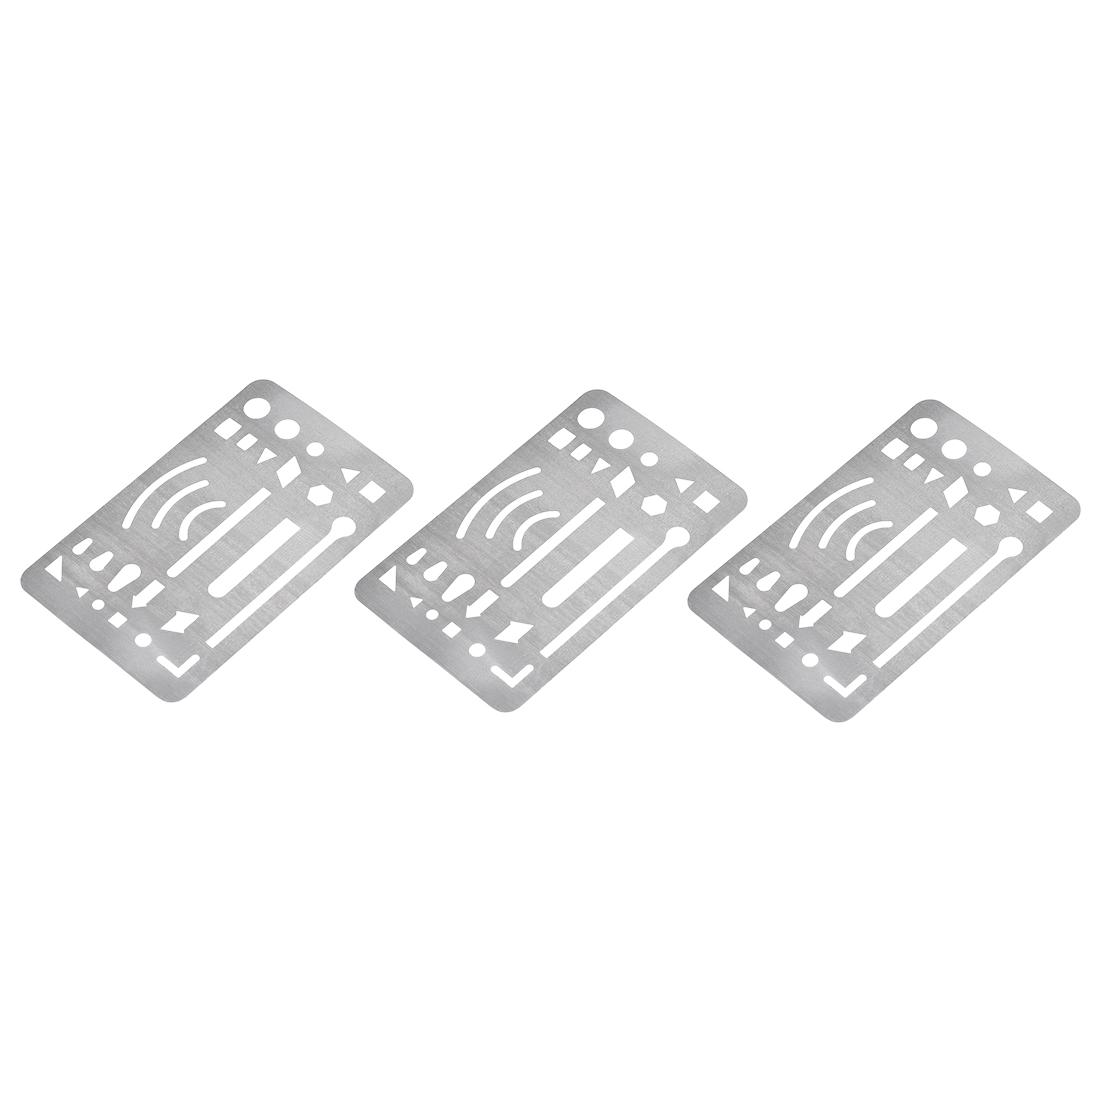 Erasing Shield 27 Patterns Stainless Steel for Drawing Engineering Design 3pcs